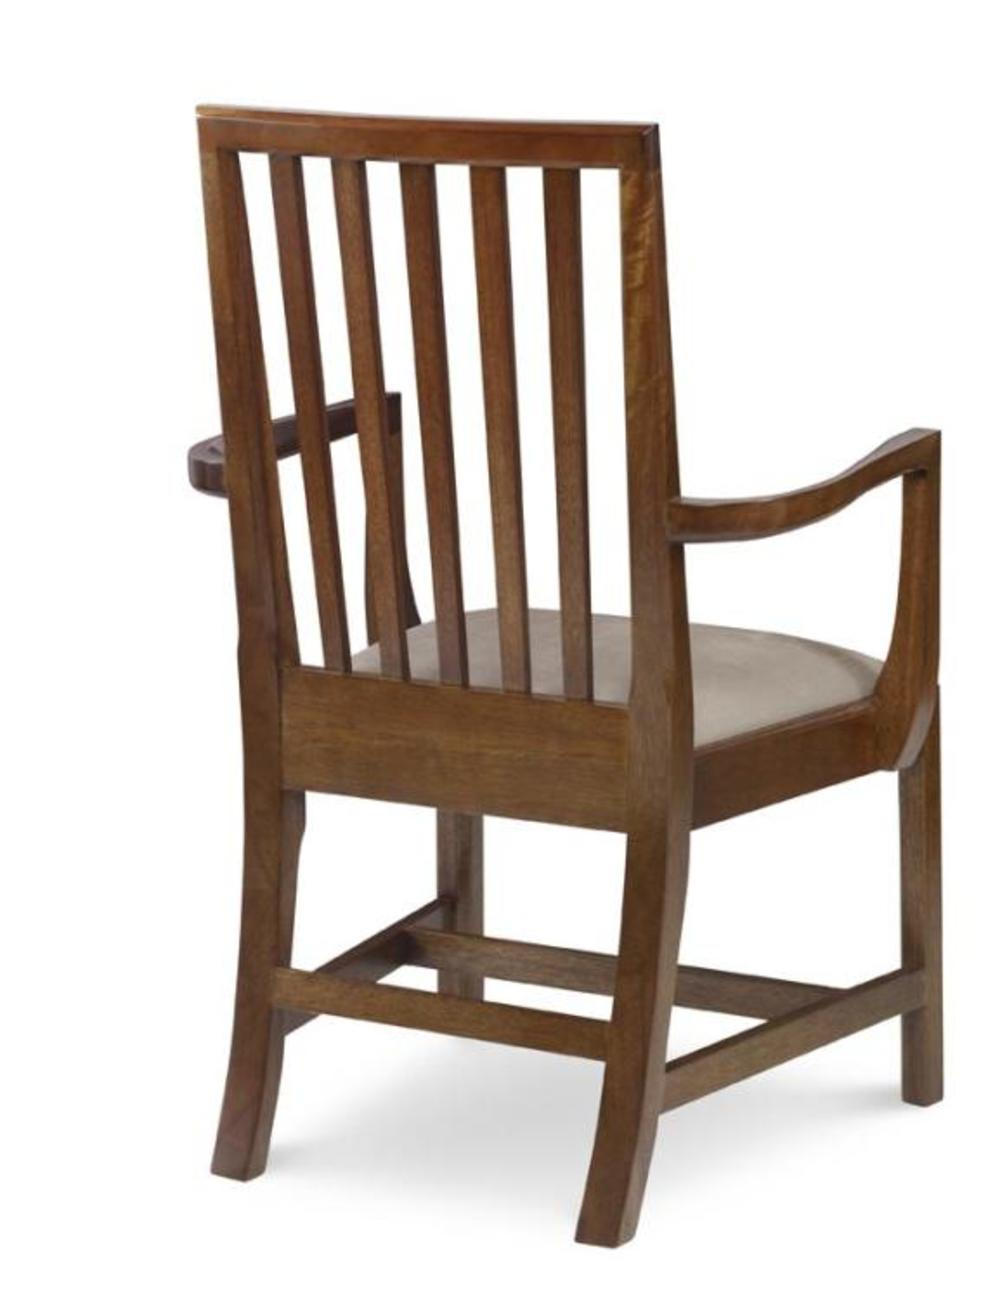 CENTURY FURNITURE - Emmett Slat Back Arm Chair